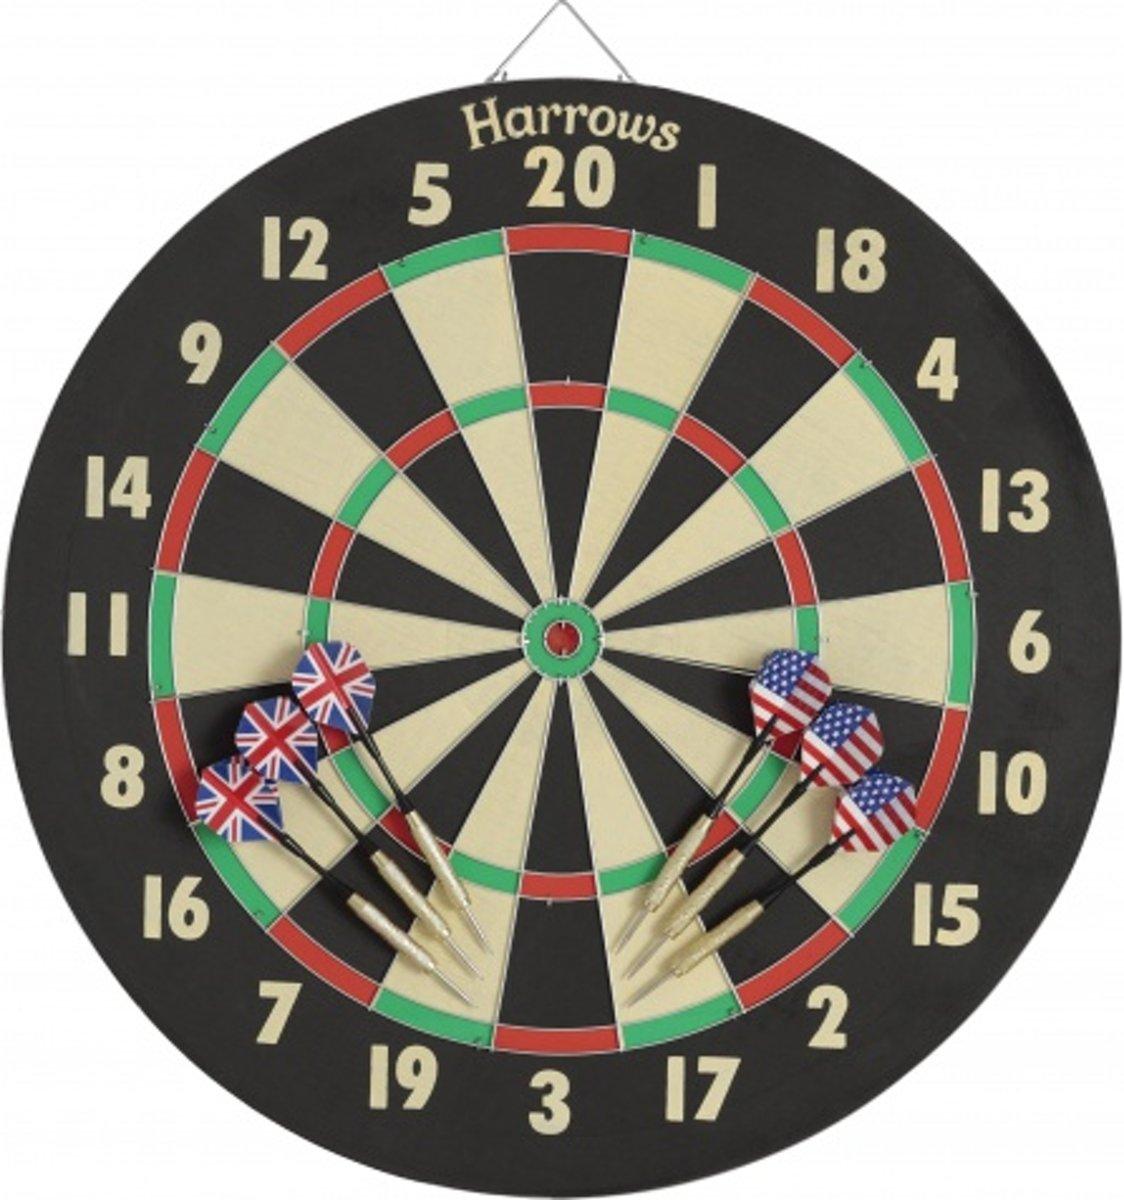 Harrows Darts Dartbord Eric Bristow Family Dart Game kopen